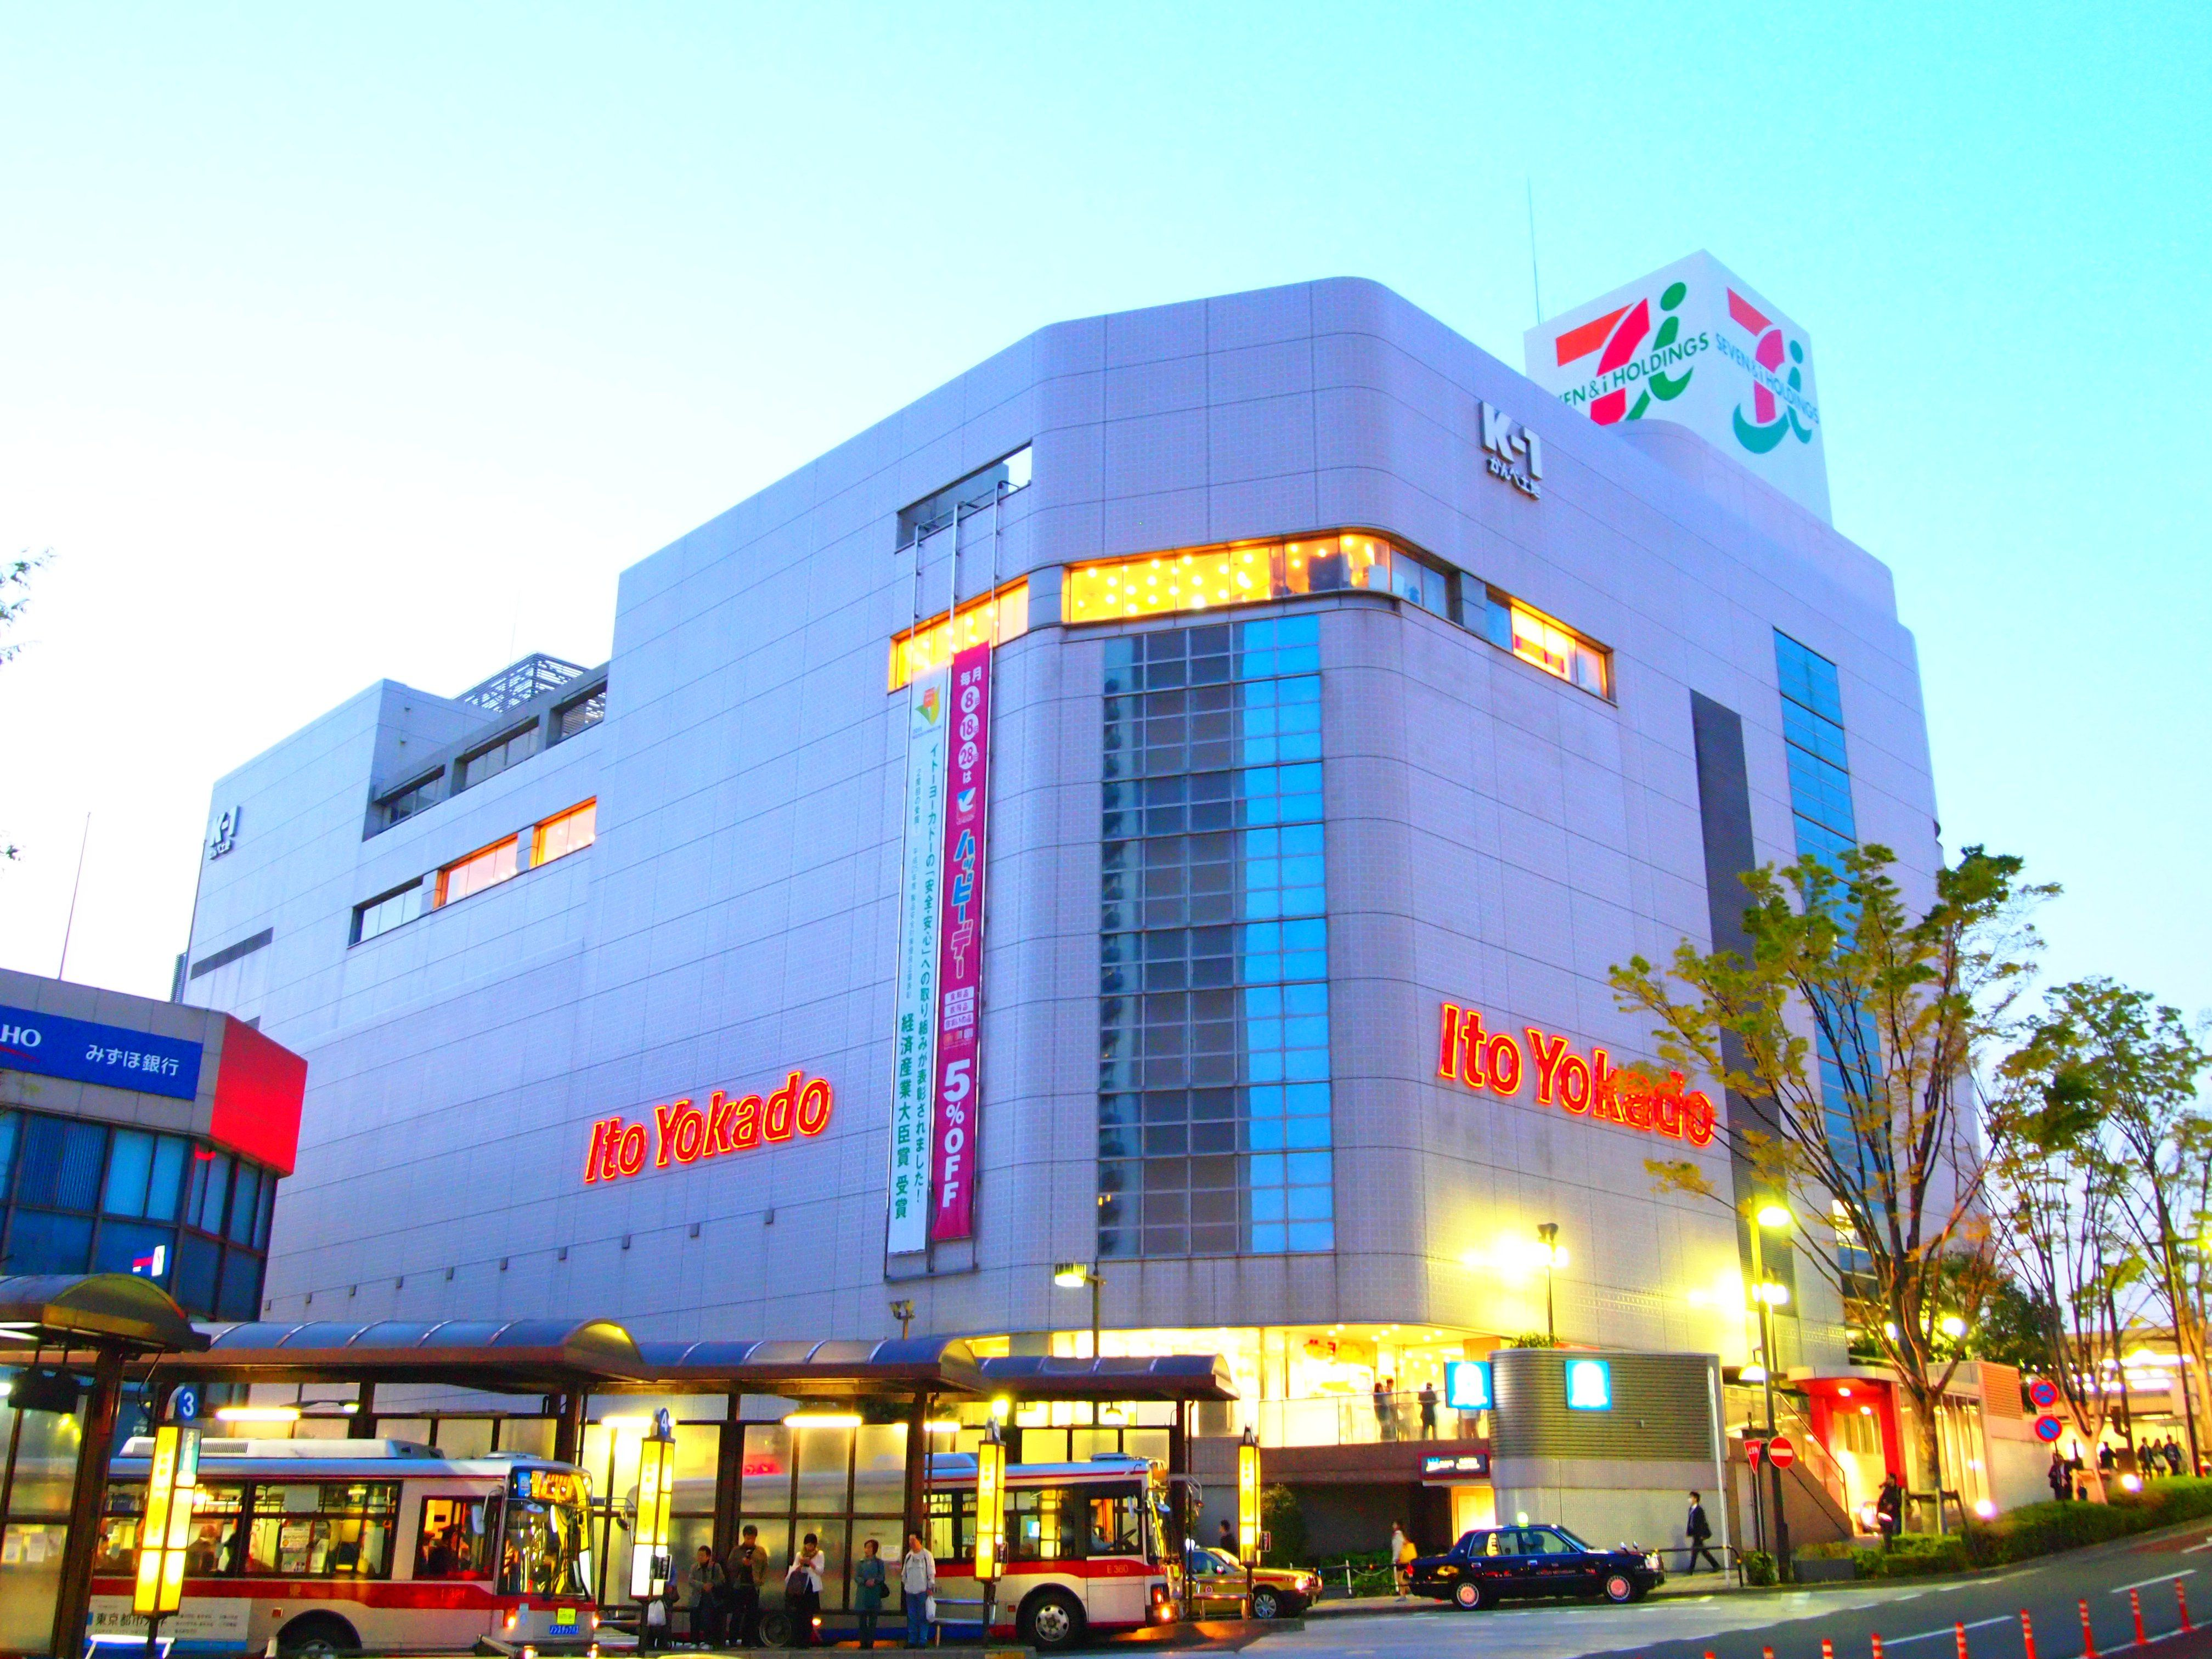 Ito-Yokado to close 40 stores - http://goo.gl/mpoNHg